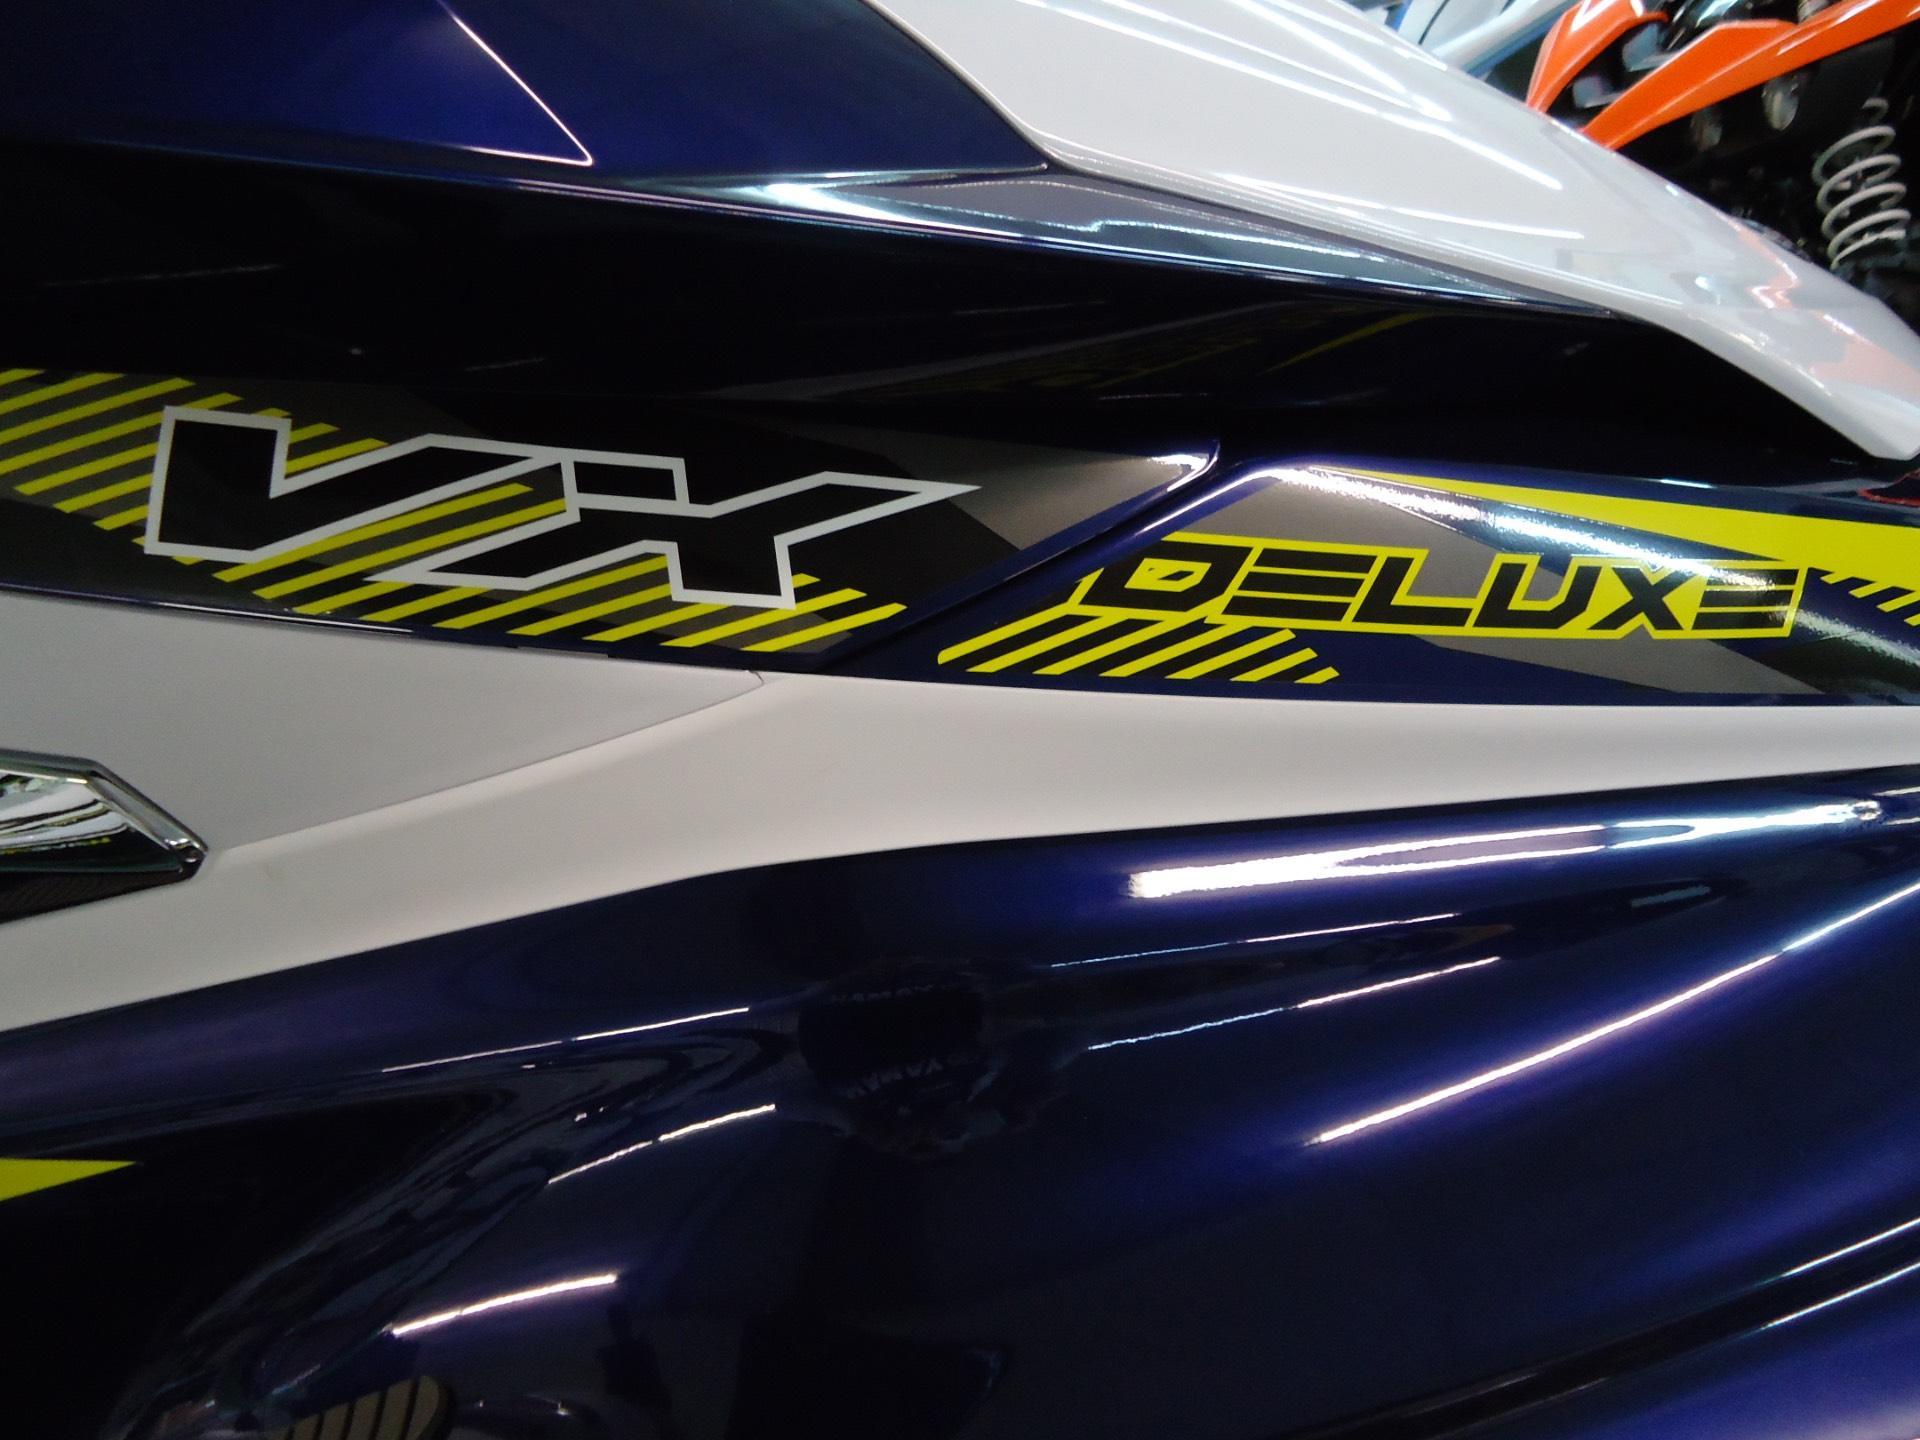 2017 Yamaha VX Deluxe 7